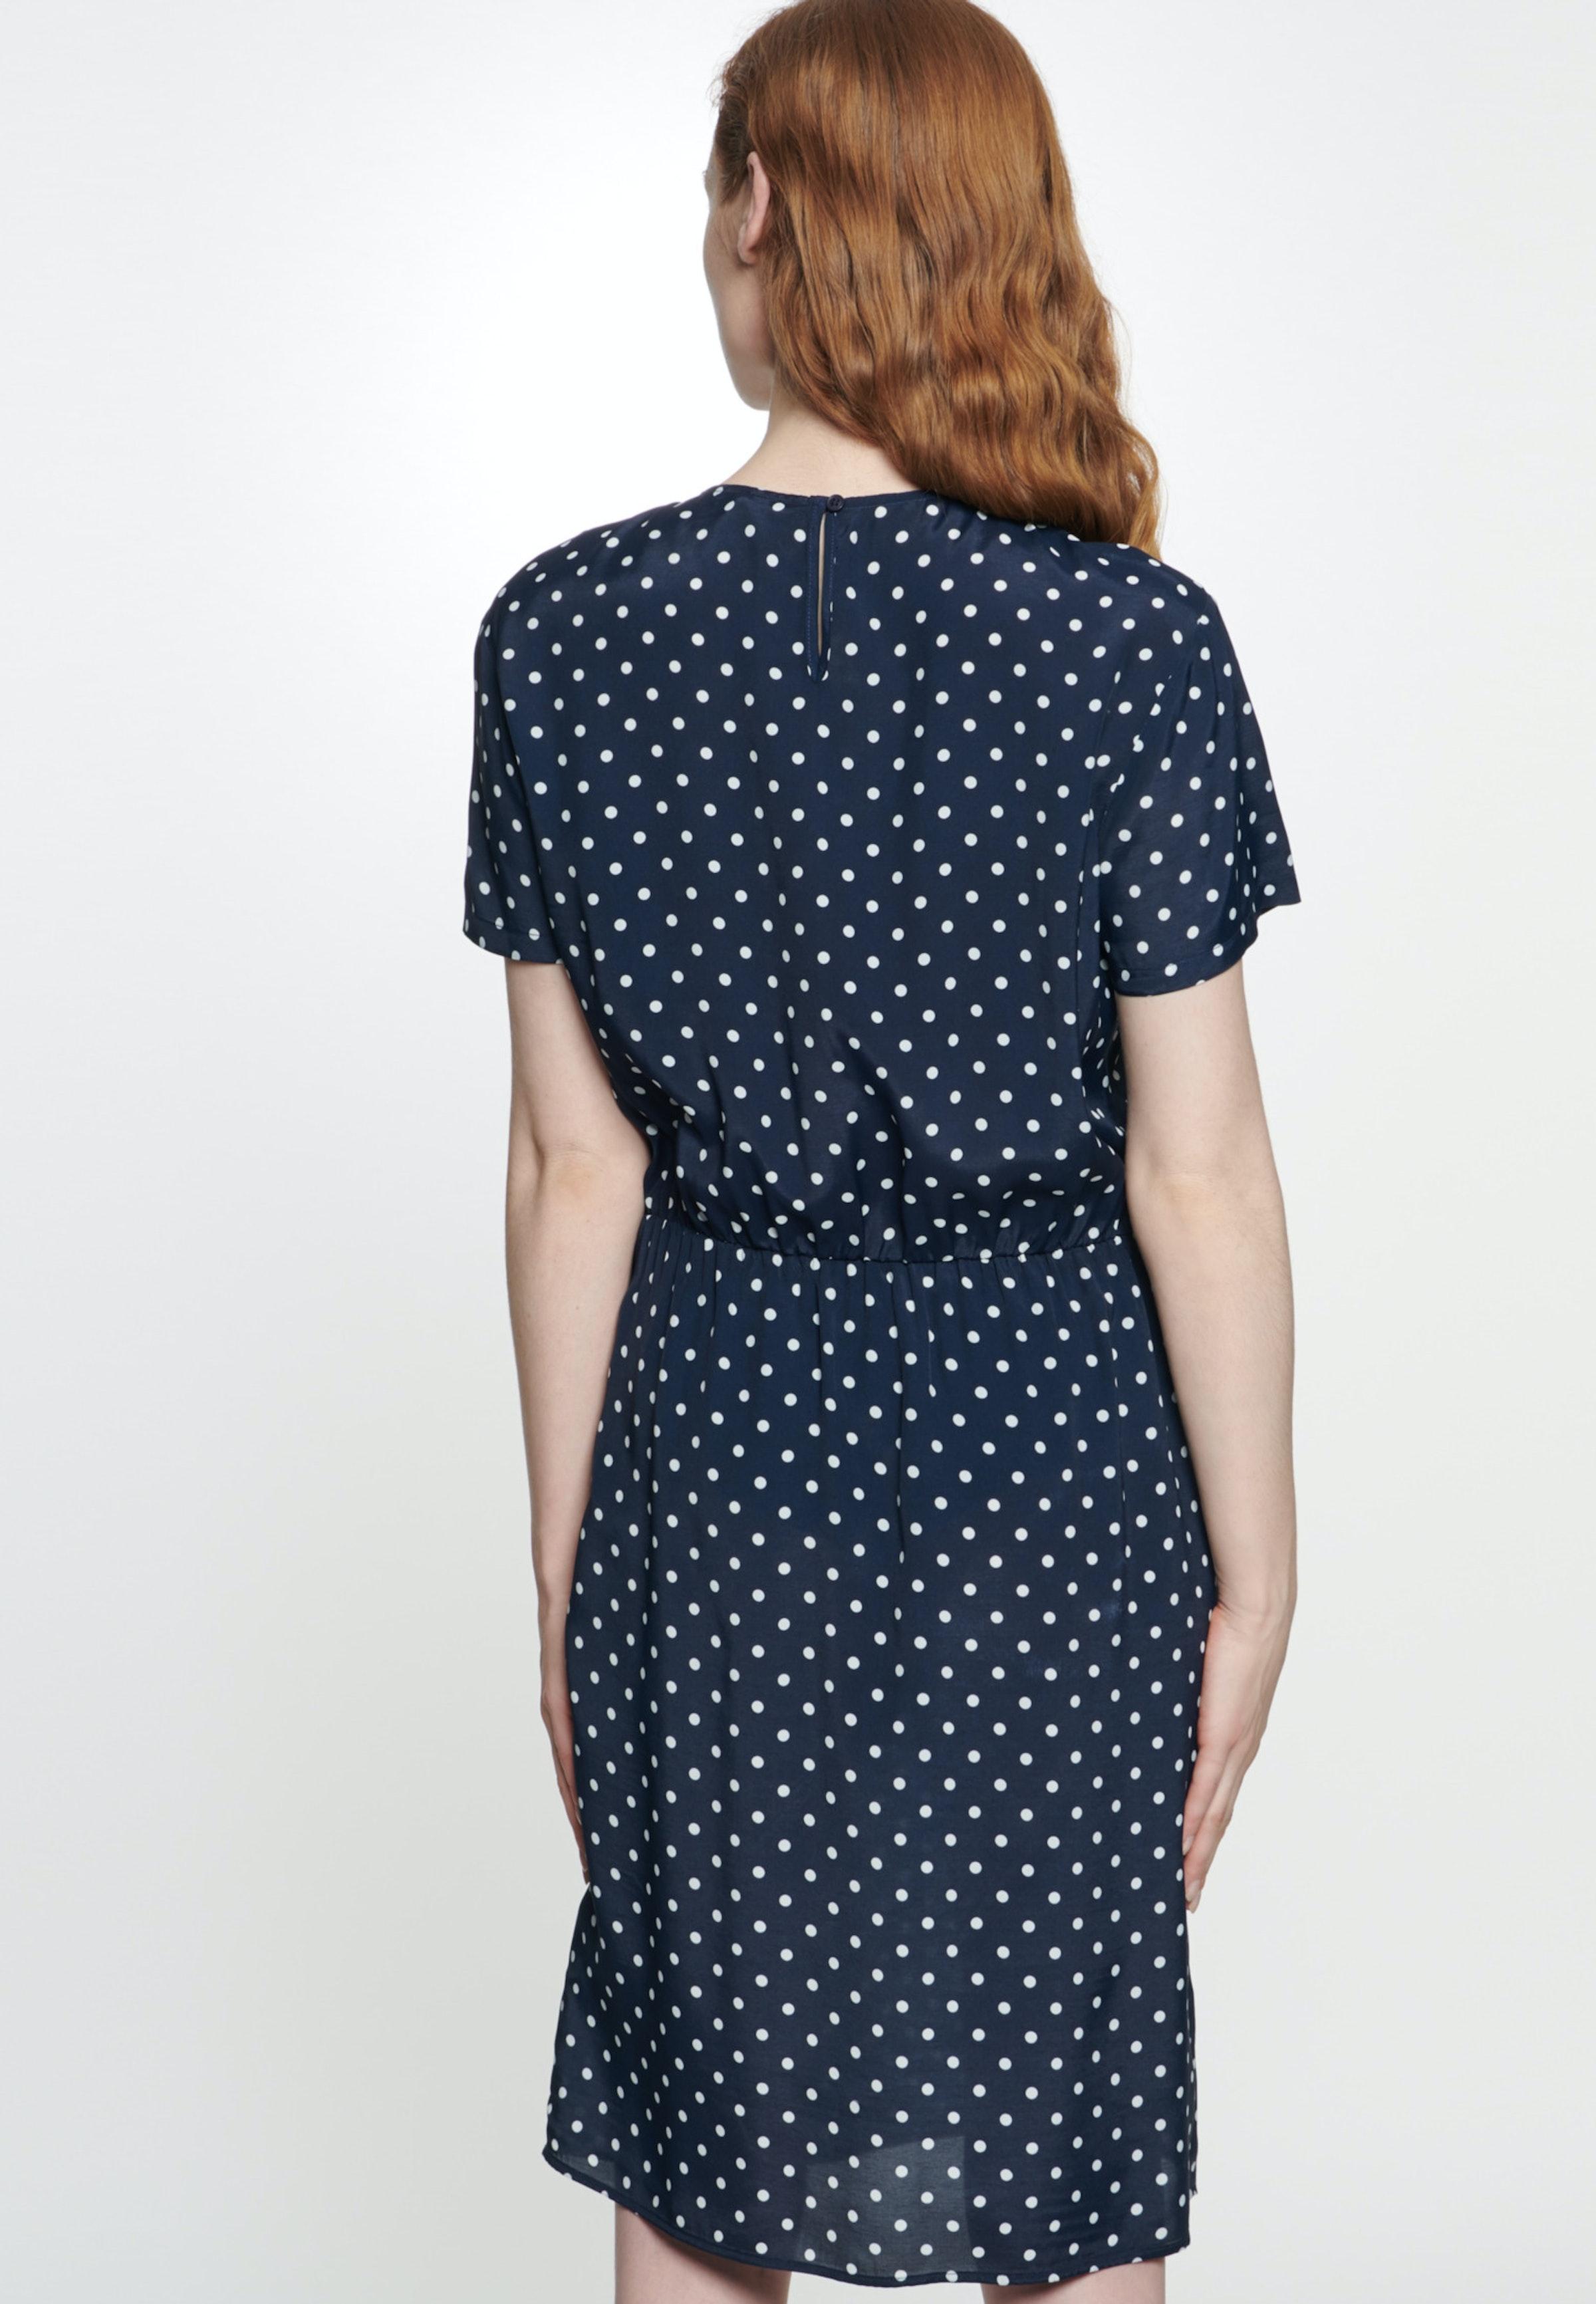 Damen Voile Midi Kleid aus 100% Viskose dunkelblau 60 ...